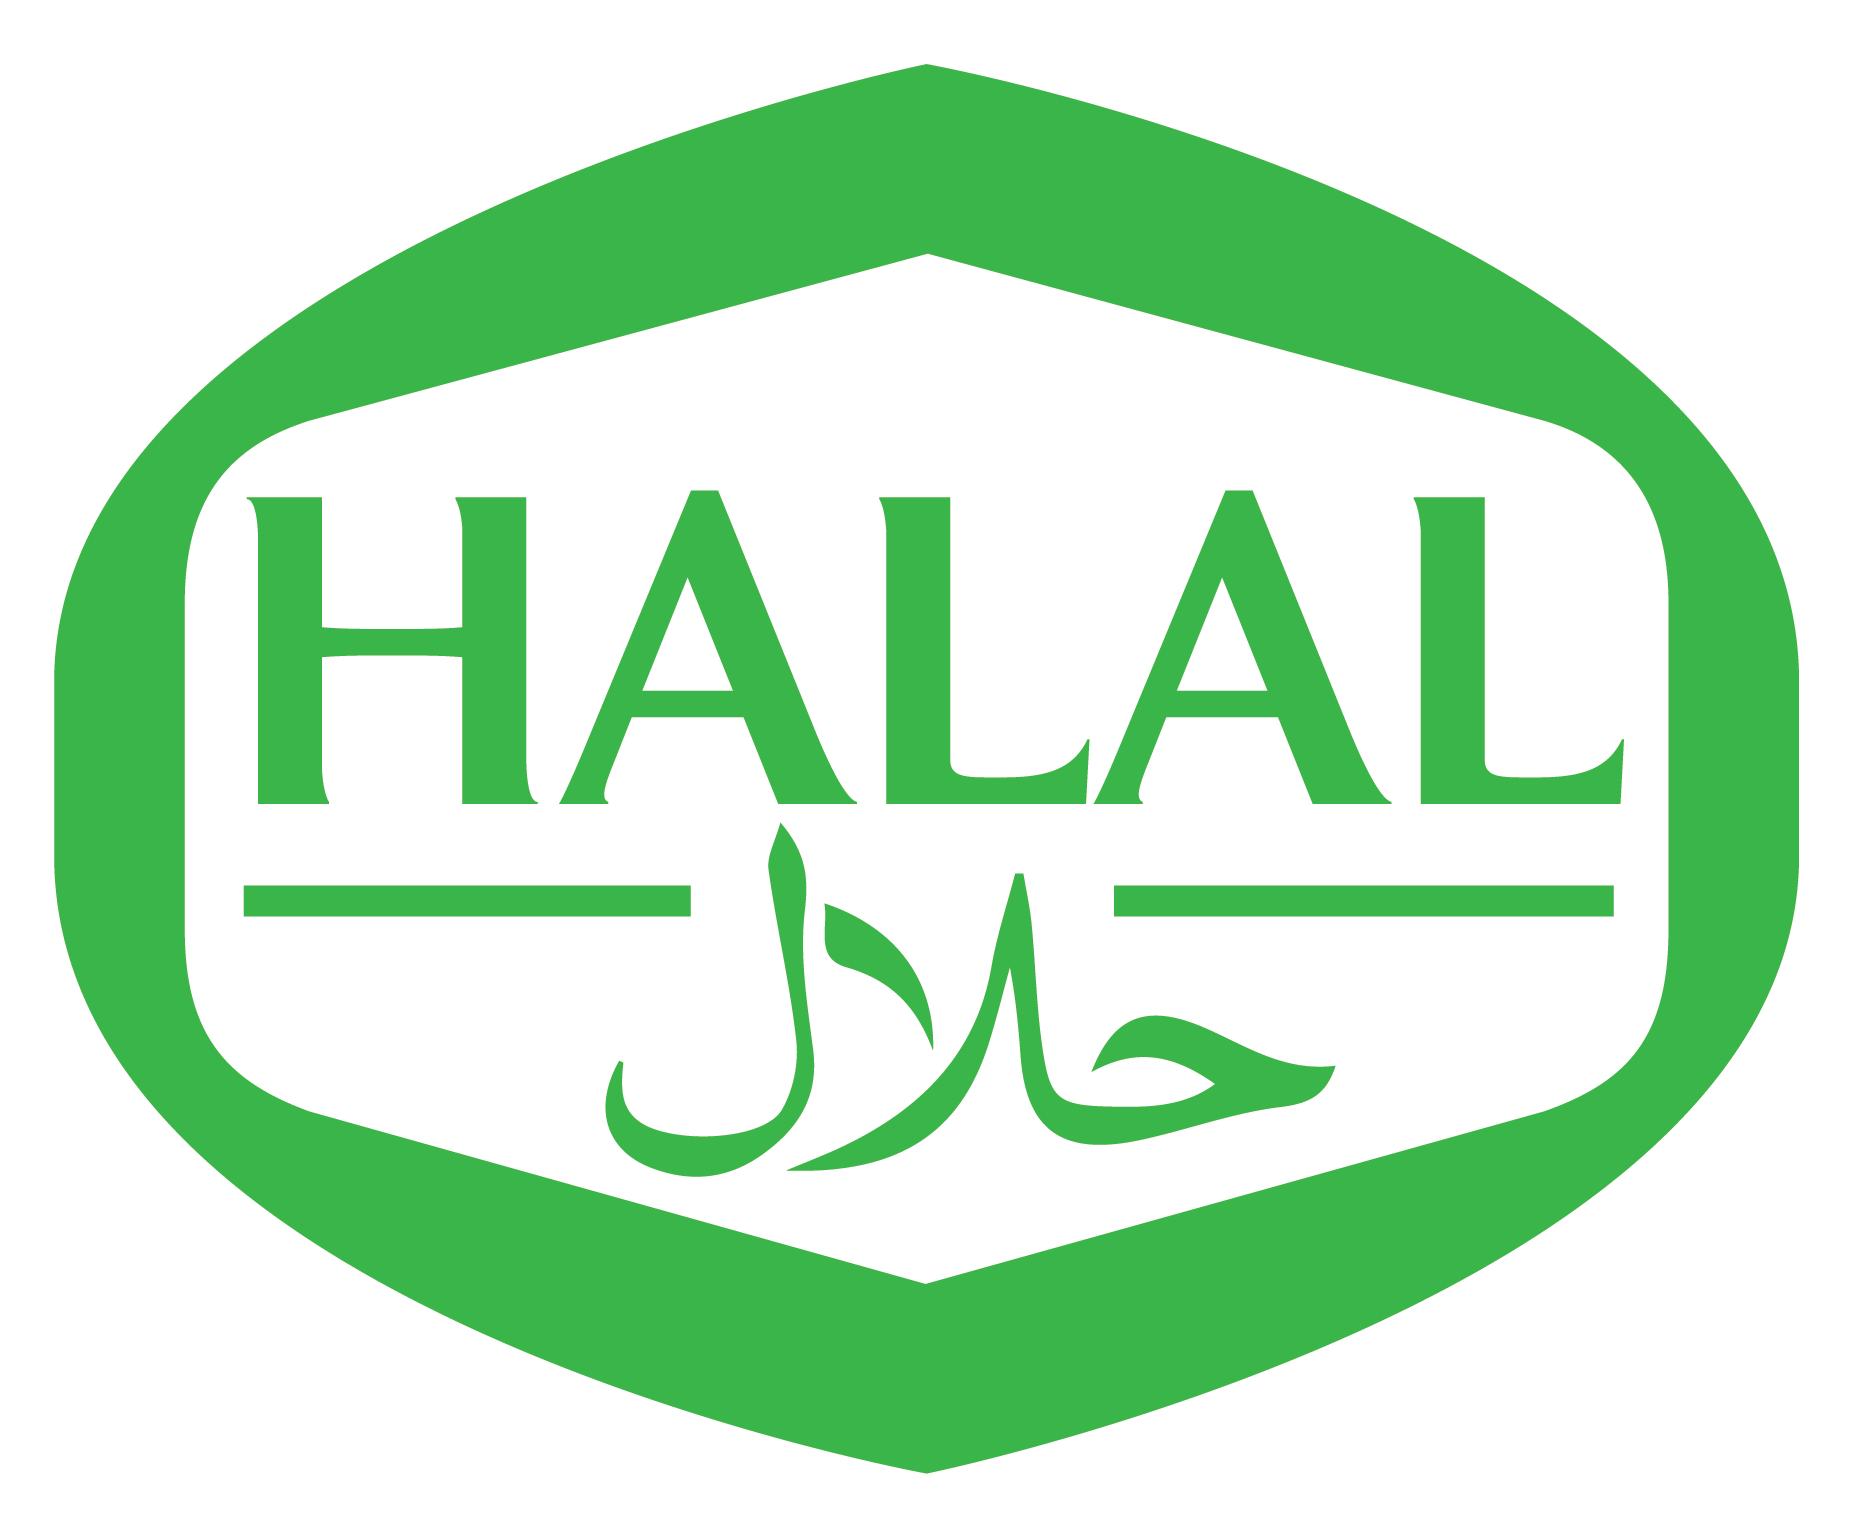 Levantis_Halal_icon